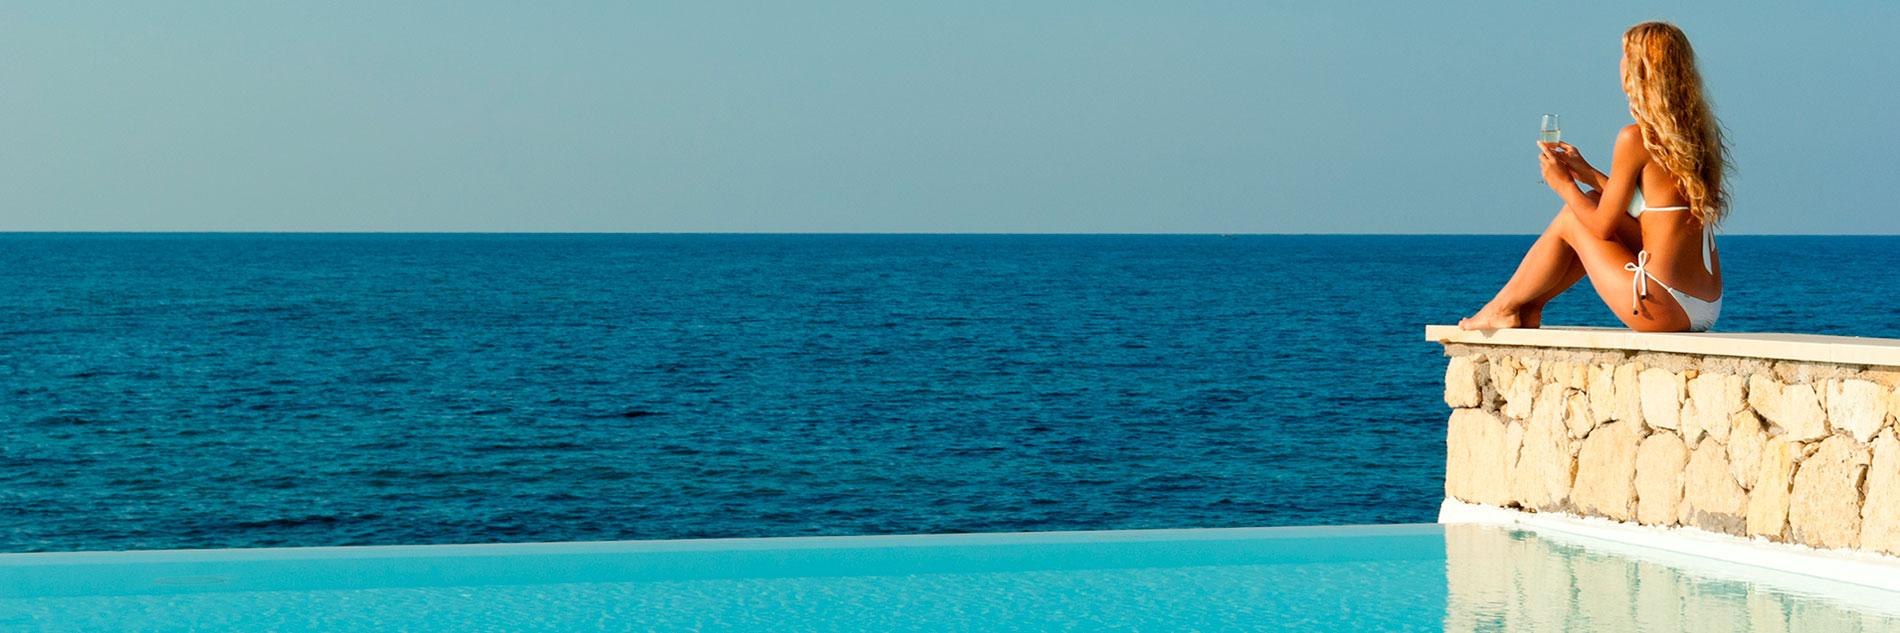 Rinoplastia Marbella